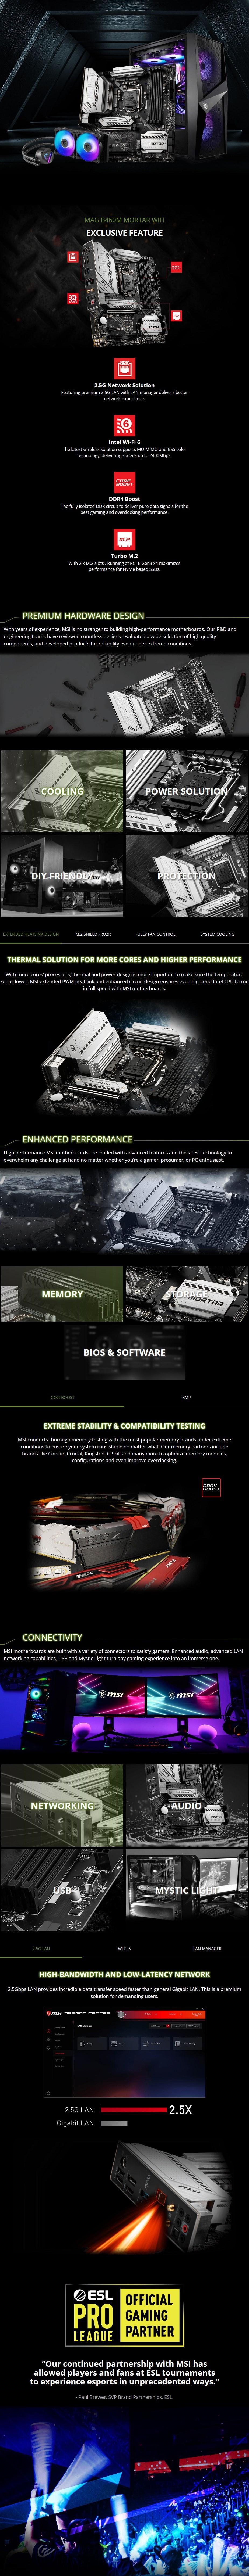 MSI MAG B460M MORTAR WIFI LGA 1200 Micro-ATX Motherboard - Overview 1